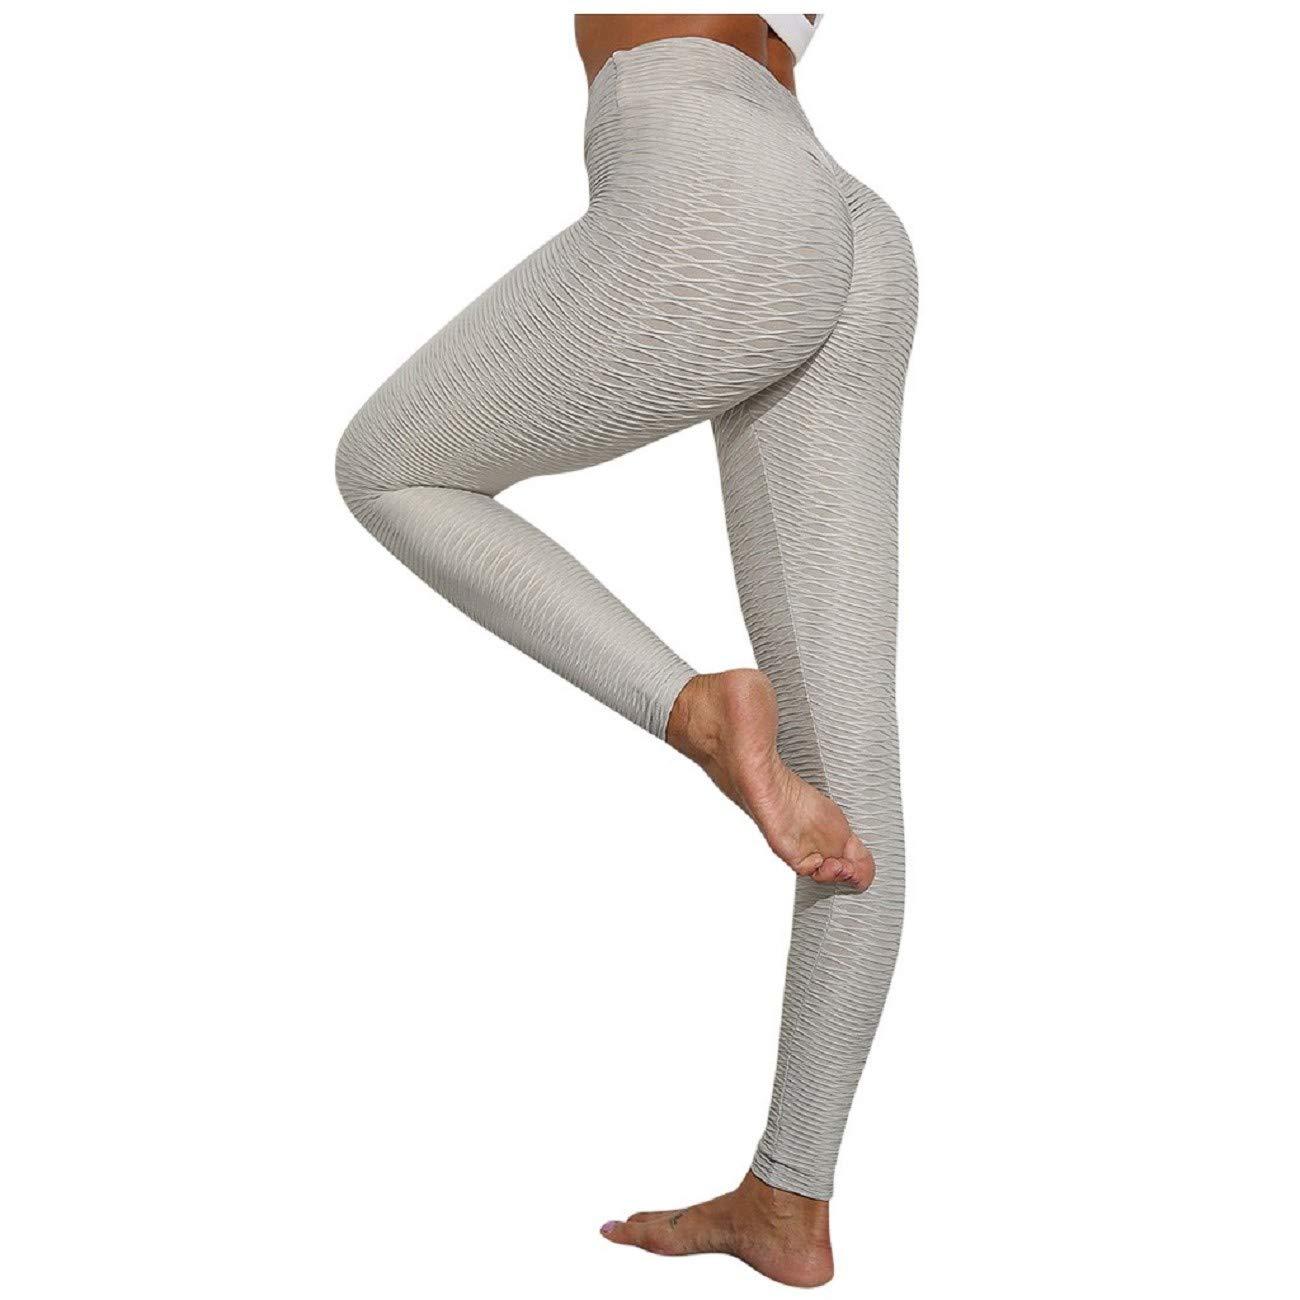 Tsmile Women High Waist Yoga Pants Cozy Stretch Luscious Tummy Control Ruched Slim Fit Leggings Butt Lift Tights